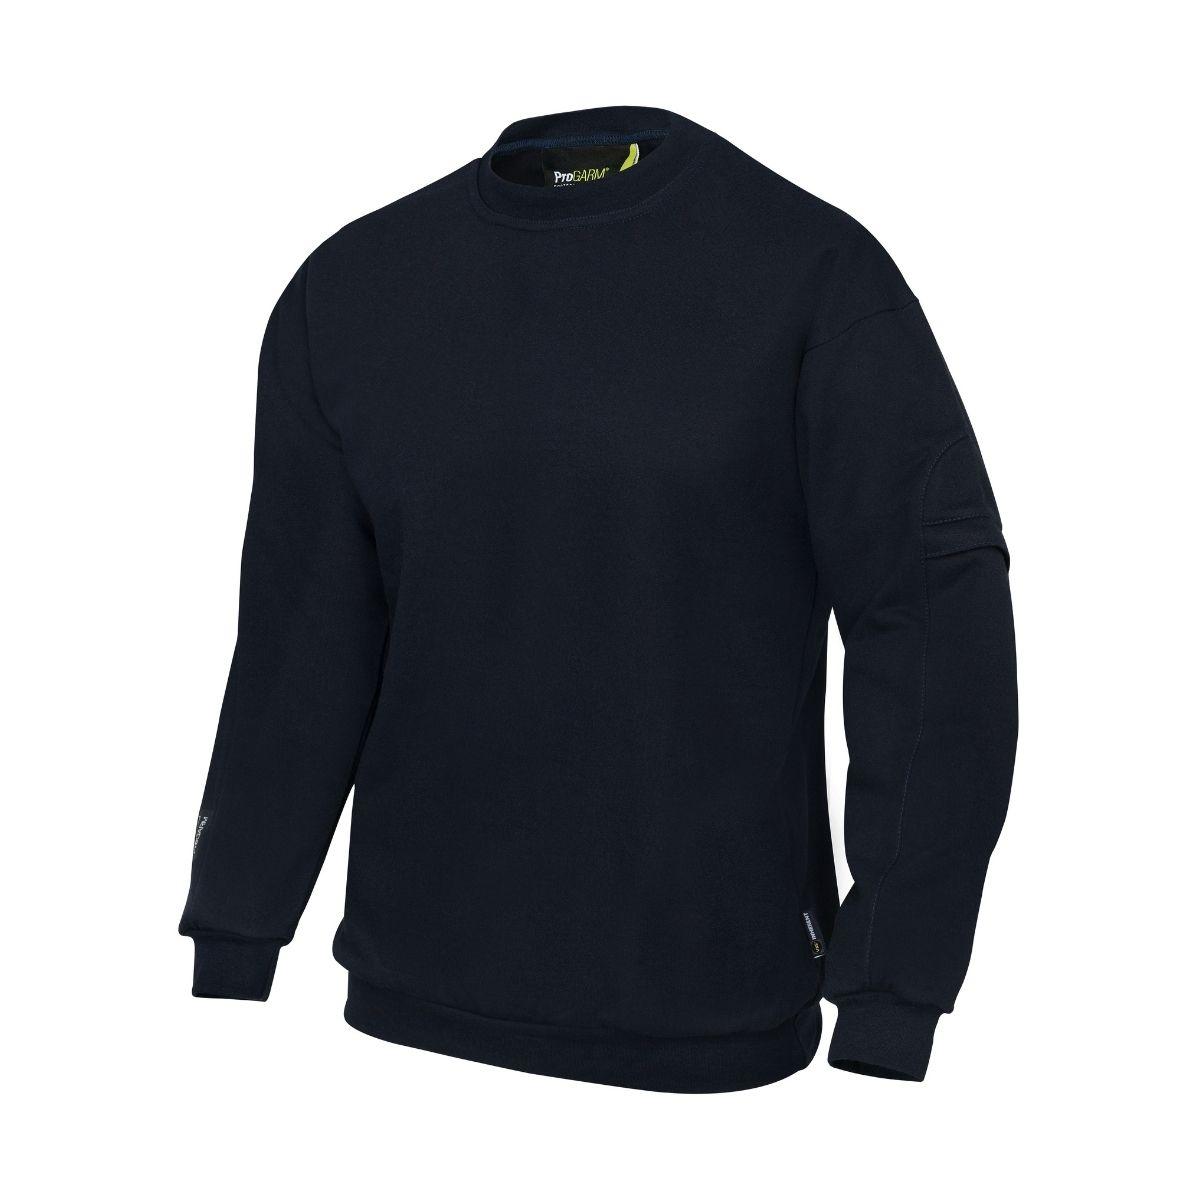 AS5630 ProGARM Sweatshirt 300gsm AS FR Inherent